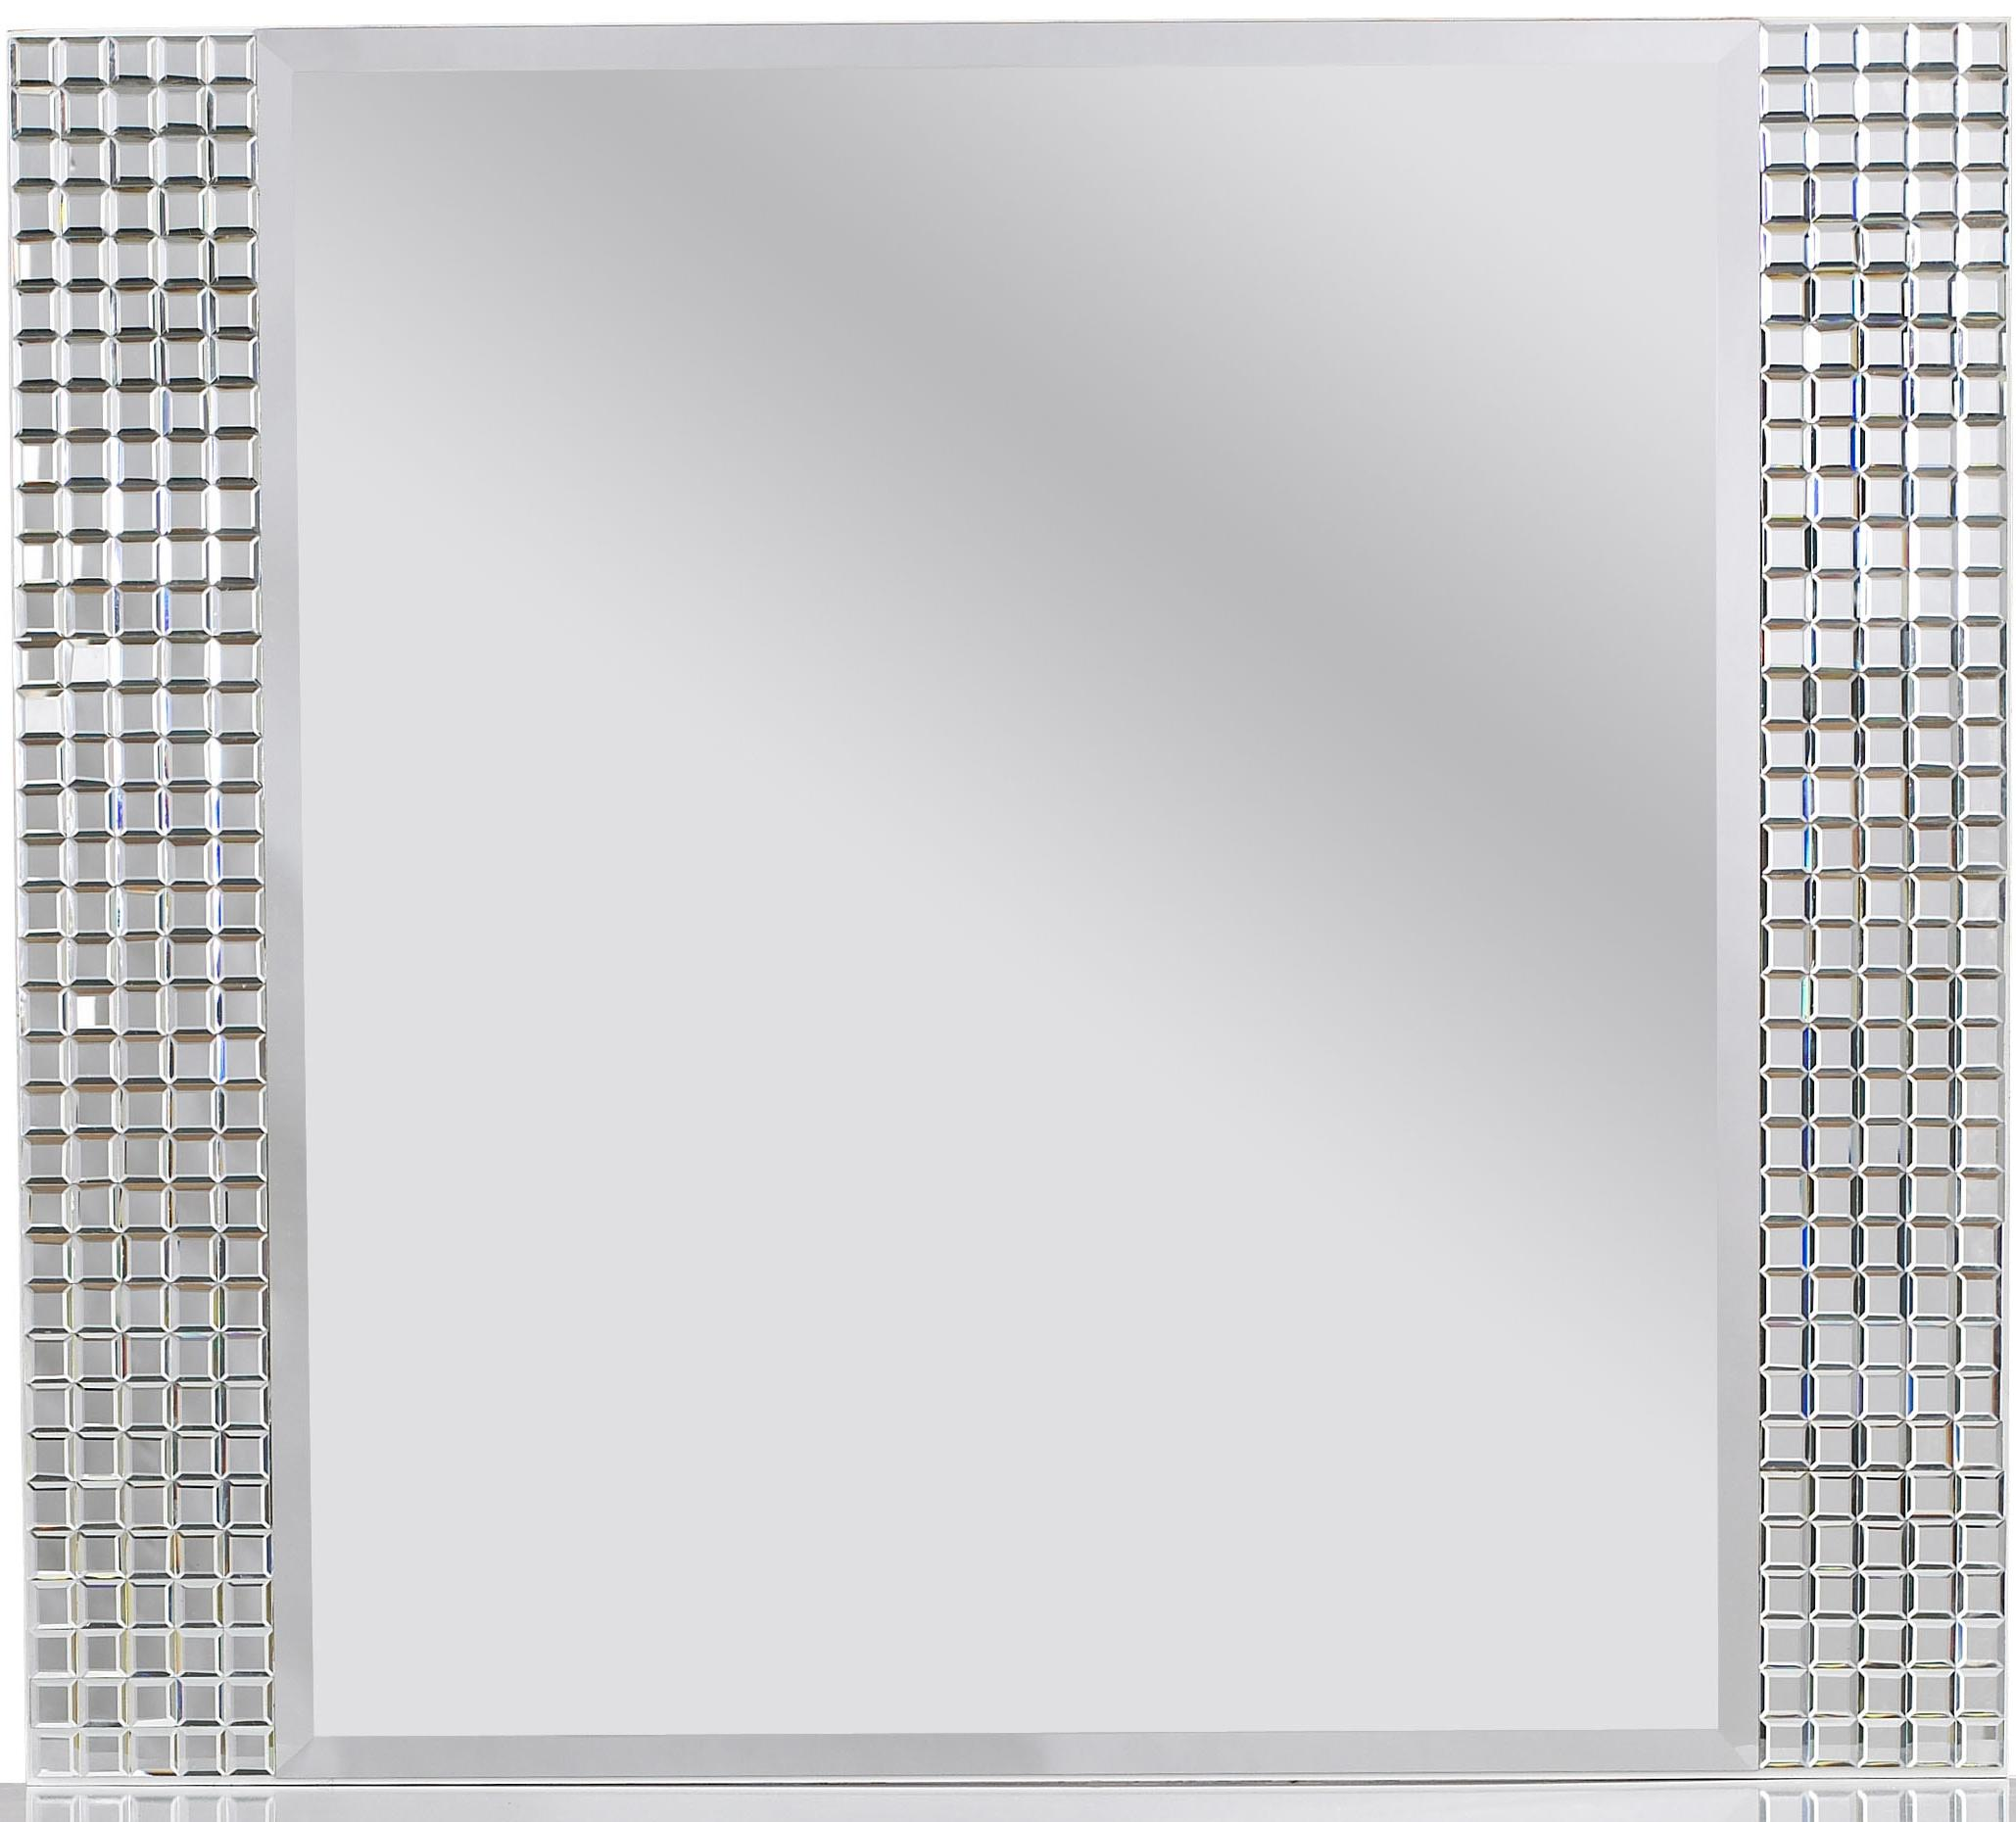 Standard Furniture Marilyn Youth Landscape Mirror - Item Number: 66318